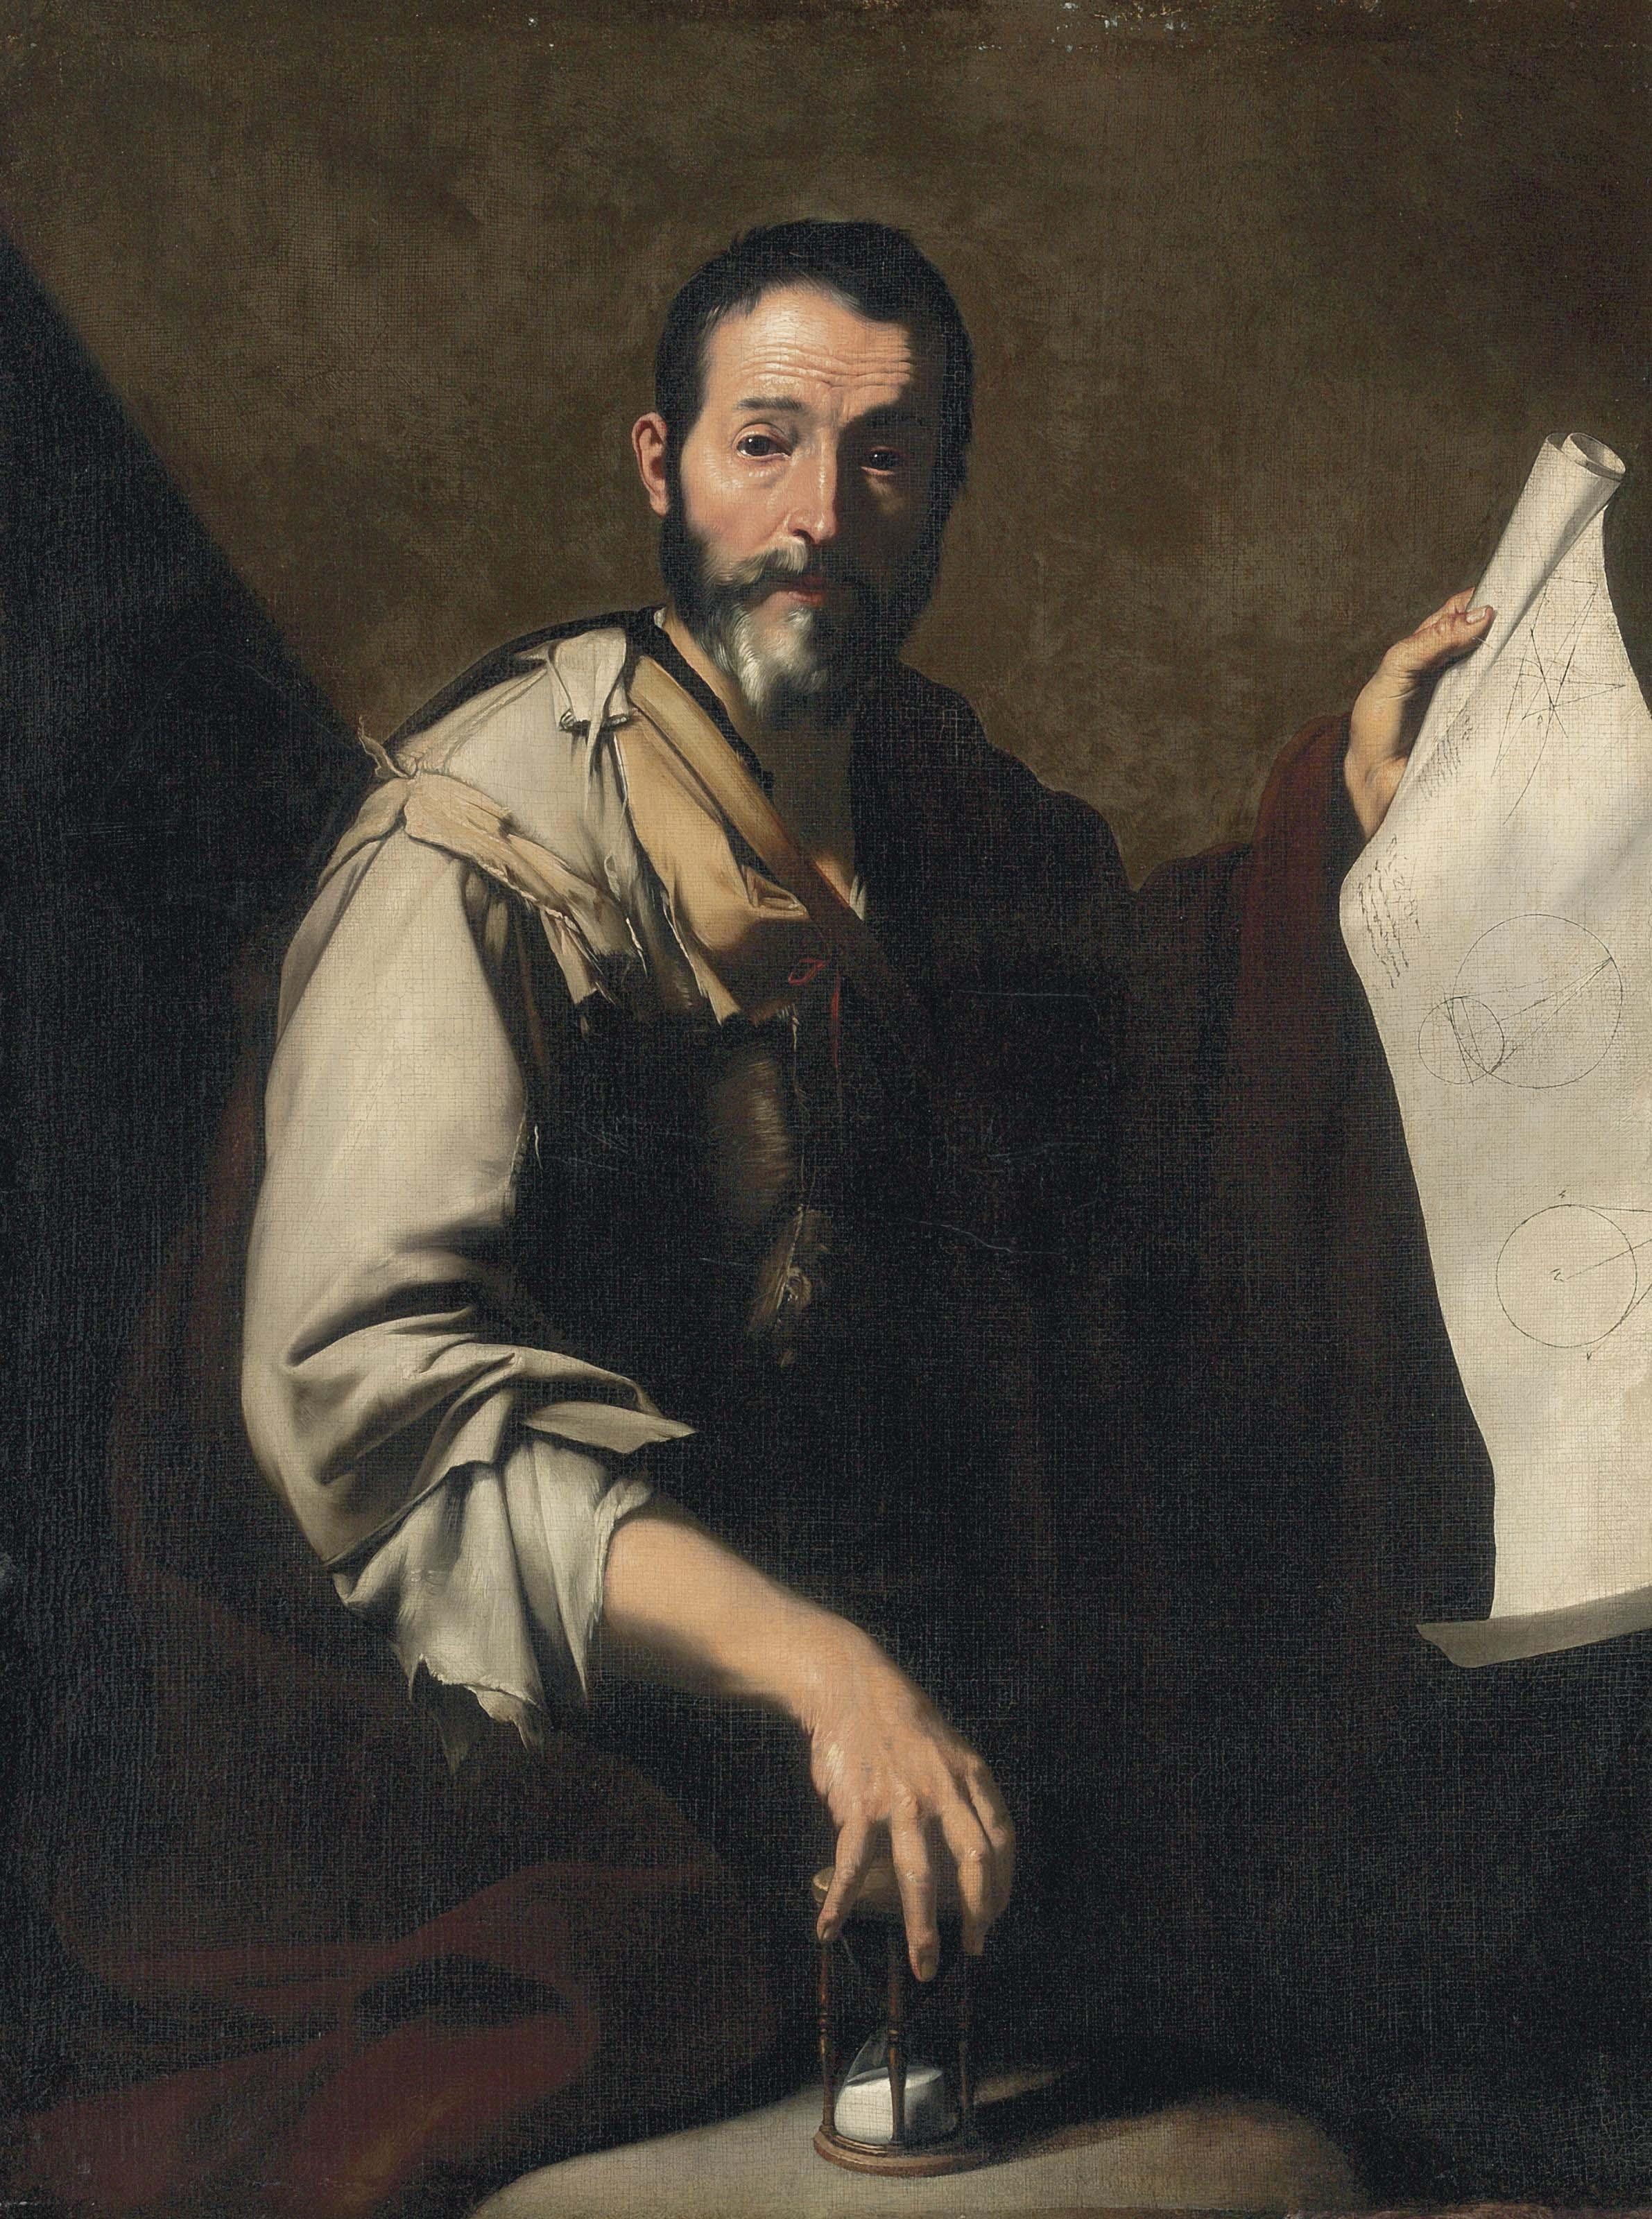 Studio of Jusepe de Ribera, lo